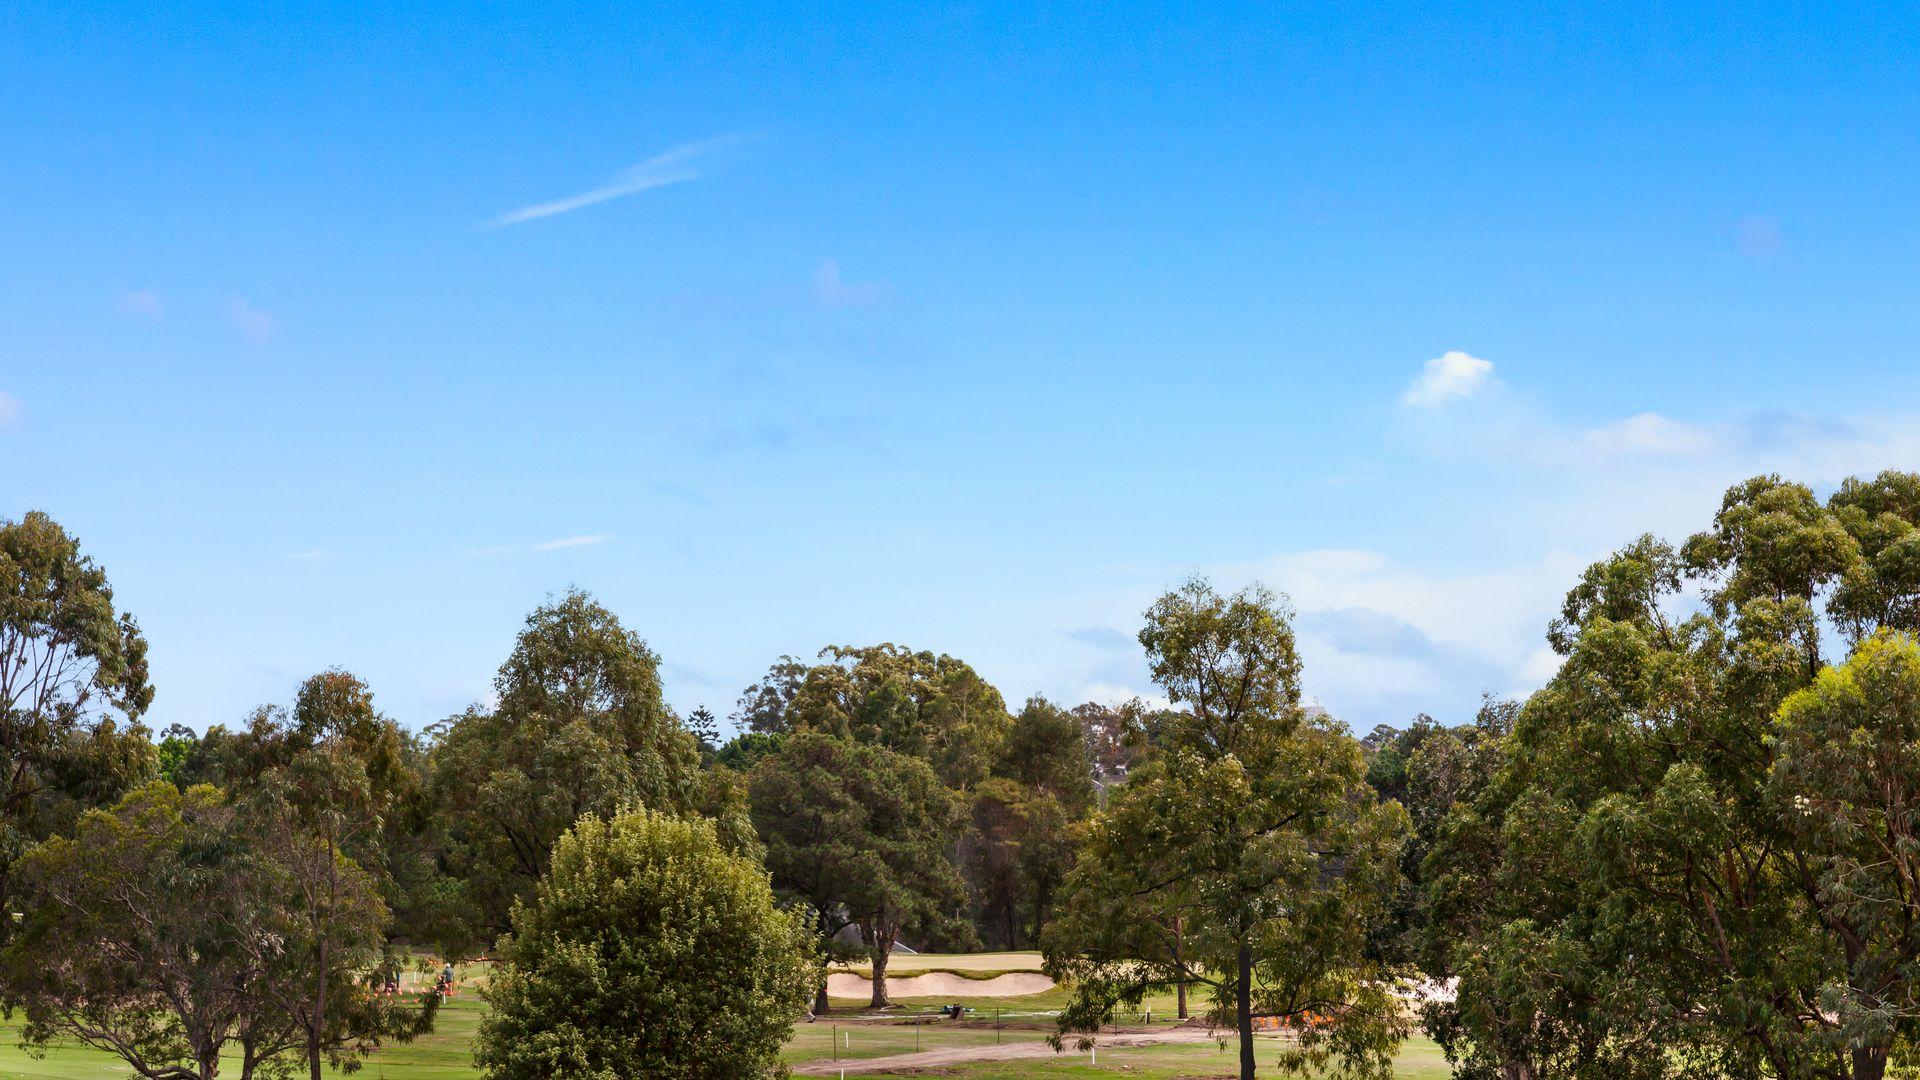 Centenary Drive, Strathfield, NSW 2135, Image 8